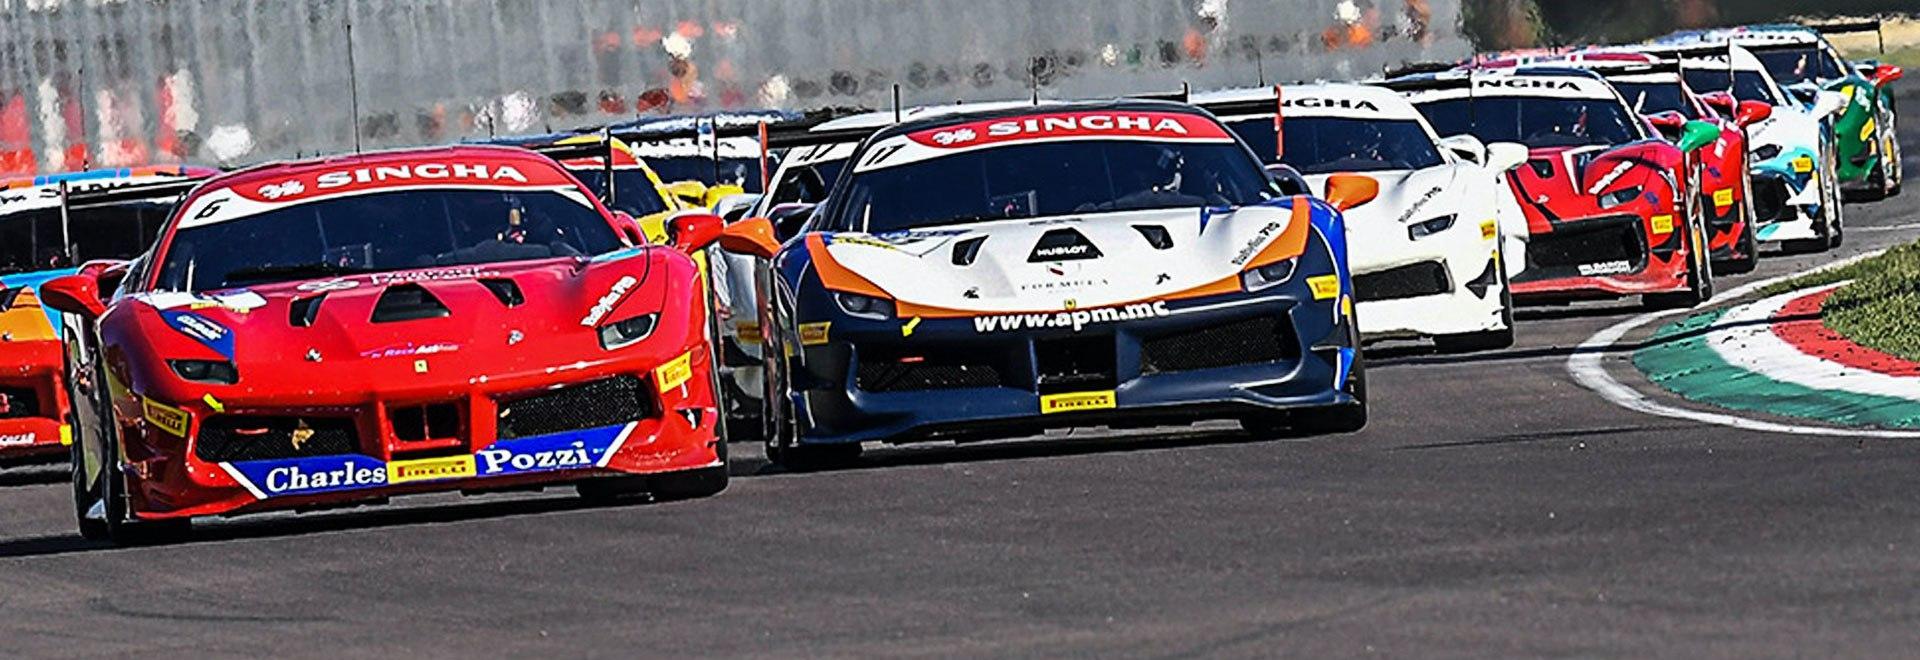 Coppa Shell Spa-Francorchamps. Gara 2